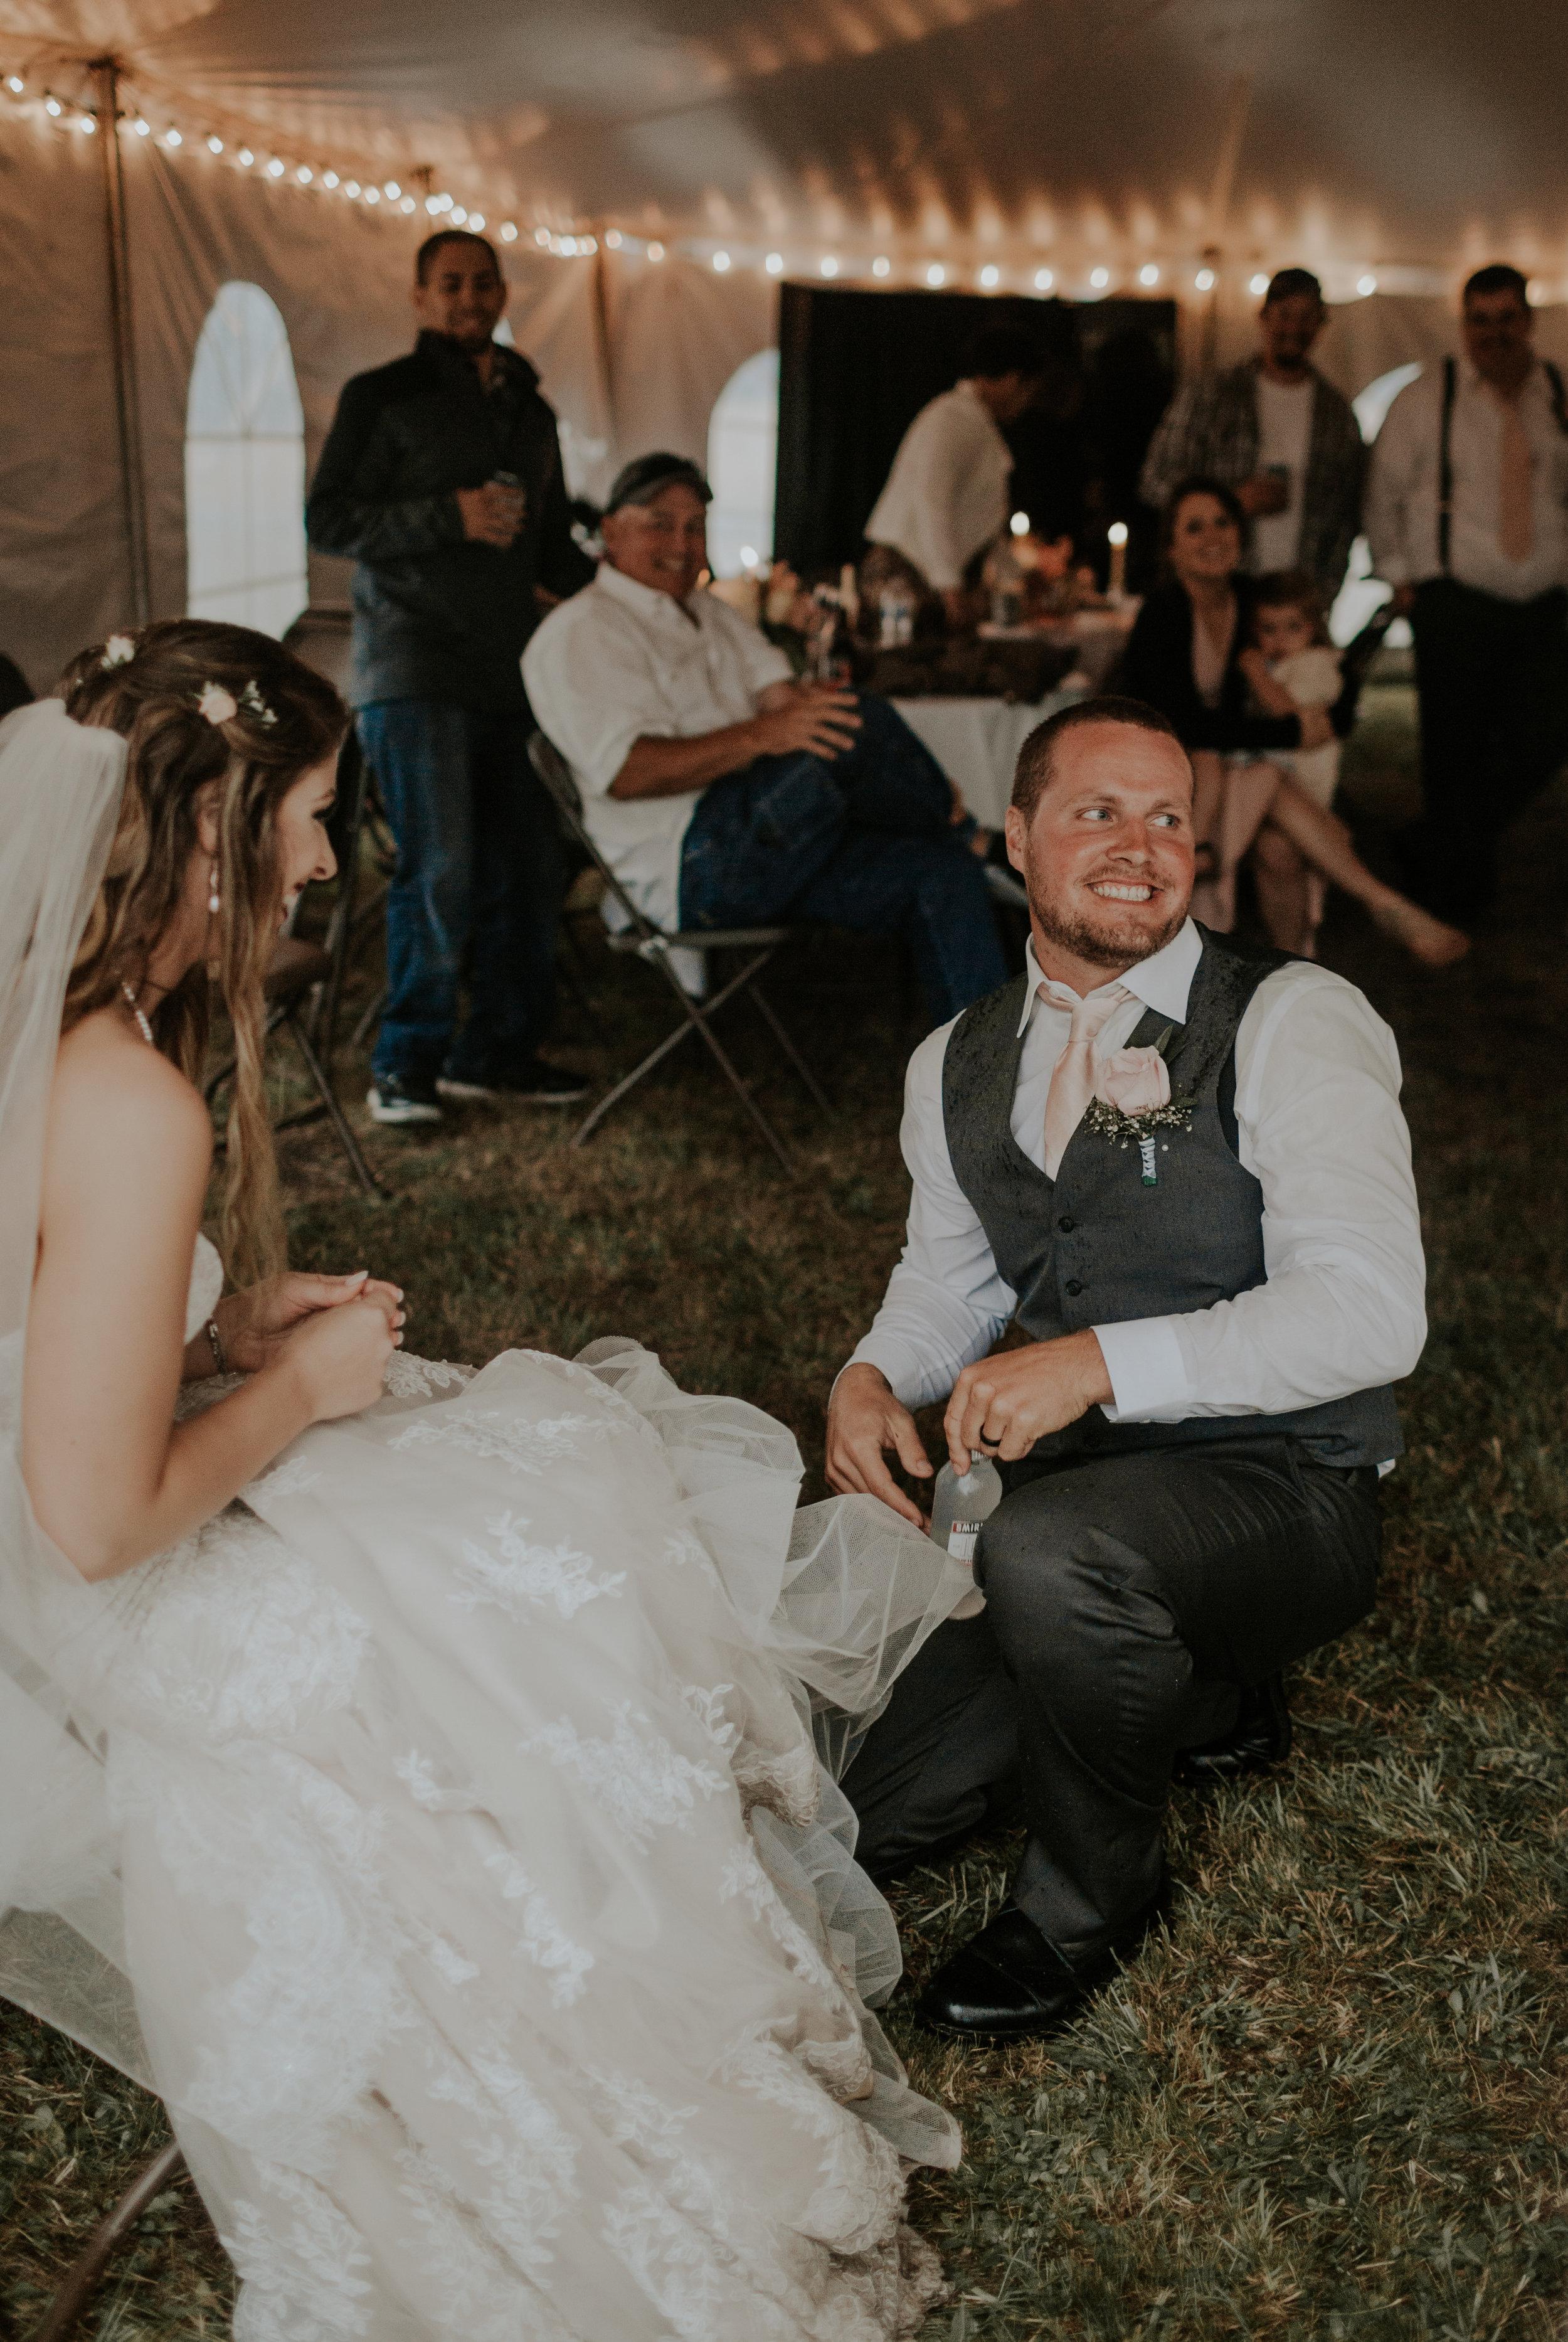 Olympic-Peninsula-Wedding-Photographer-PNW-Forks-Port-Angeles-Kayla-Dawn-Photography-engagement-Olympic-National-Park-215.jpg